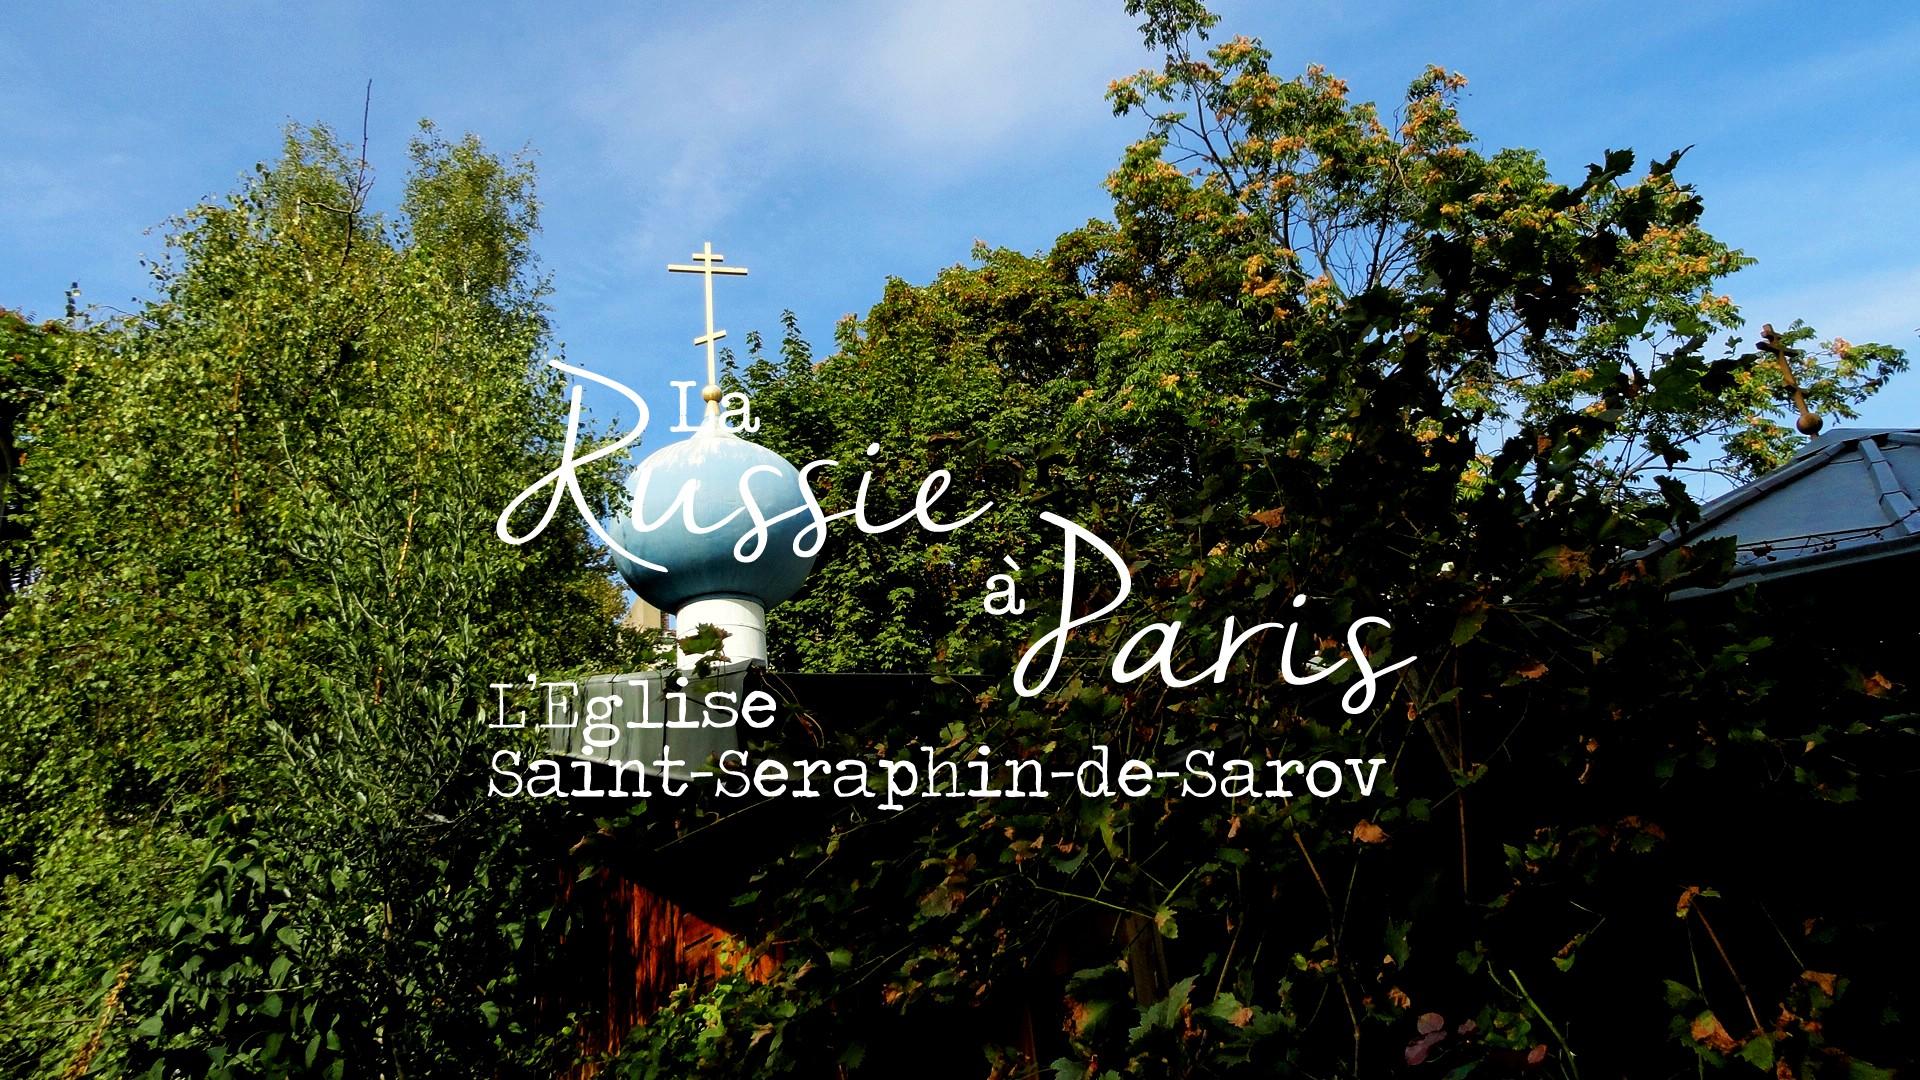 20141015_eglise-st-seraphine-de-sarov_V2 (Large)